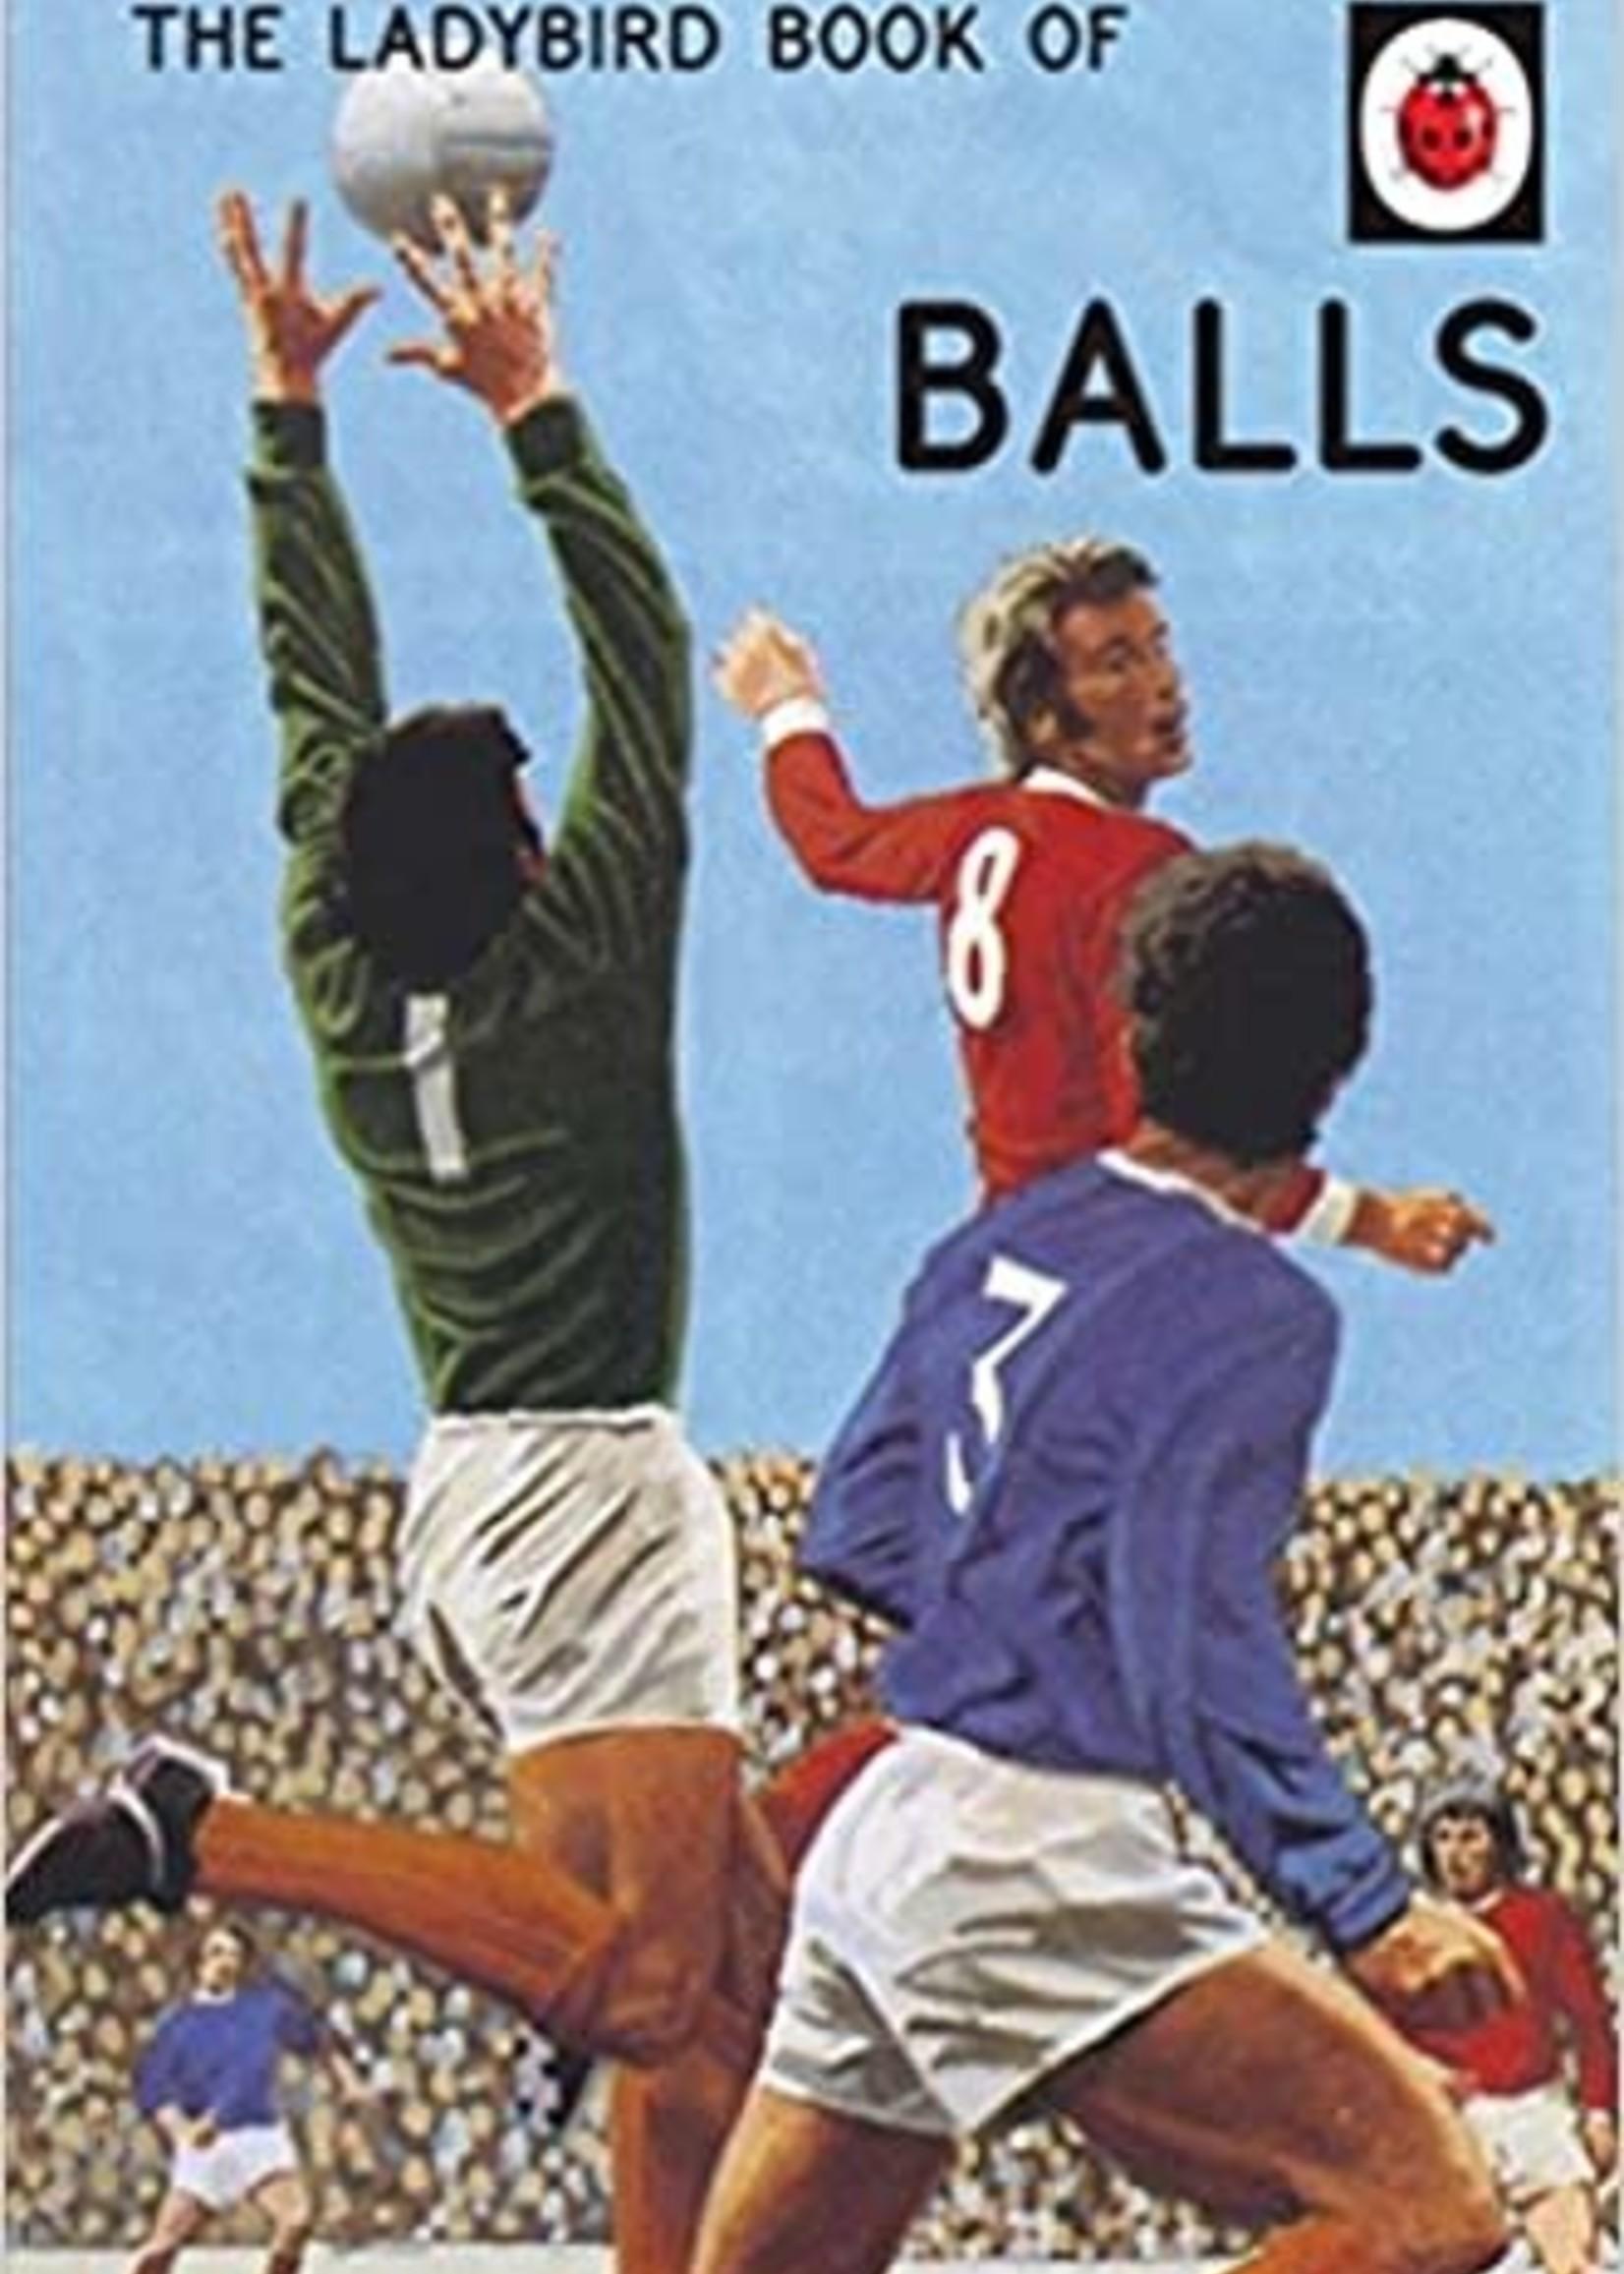 Penguin Random House The Ladybird Book of Balls